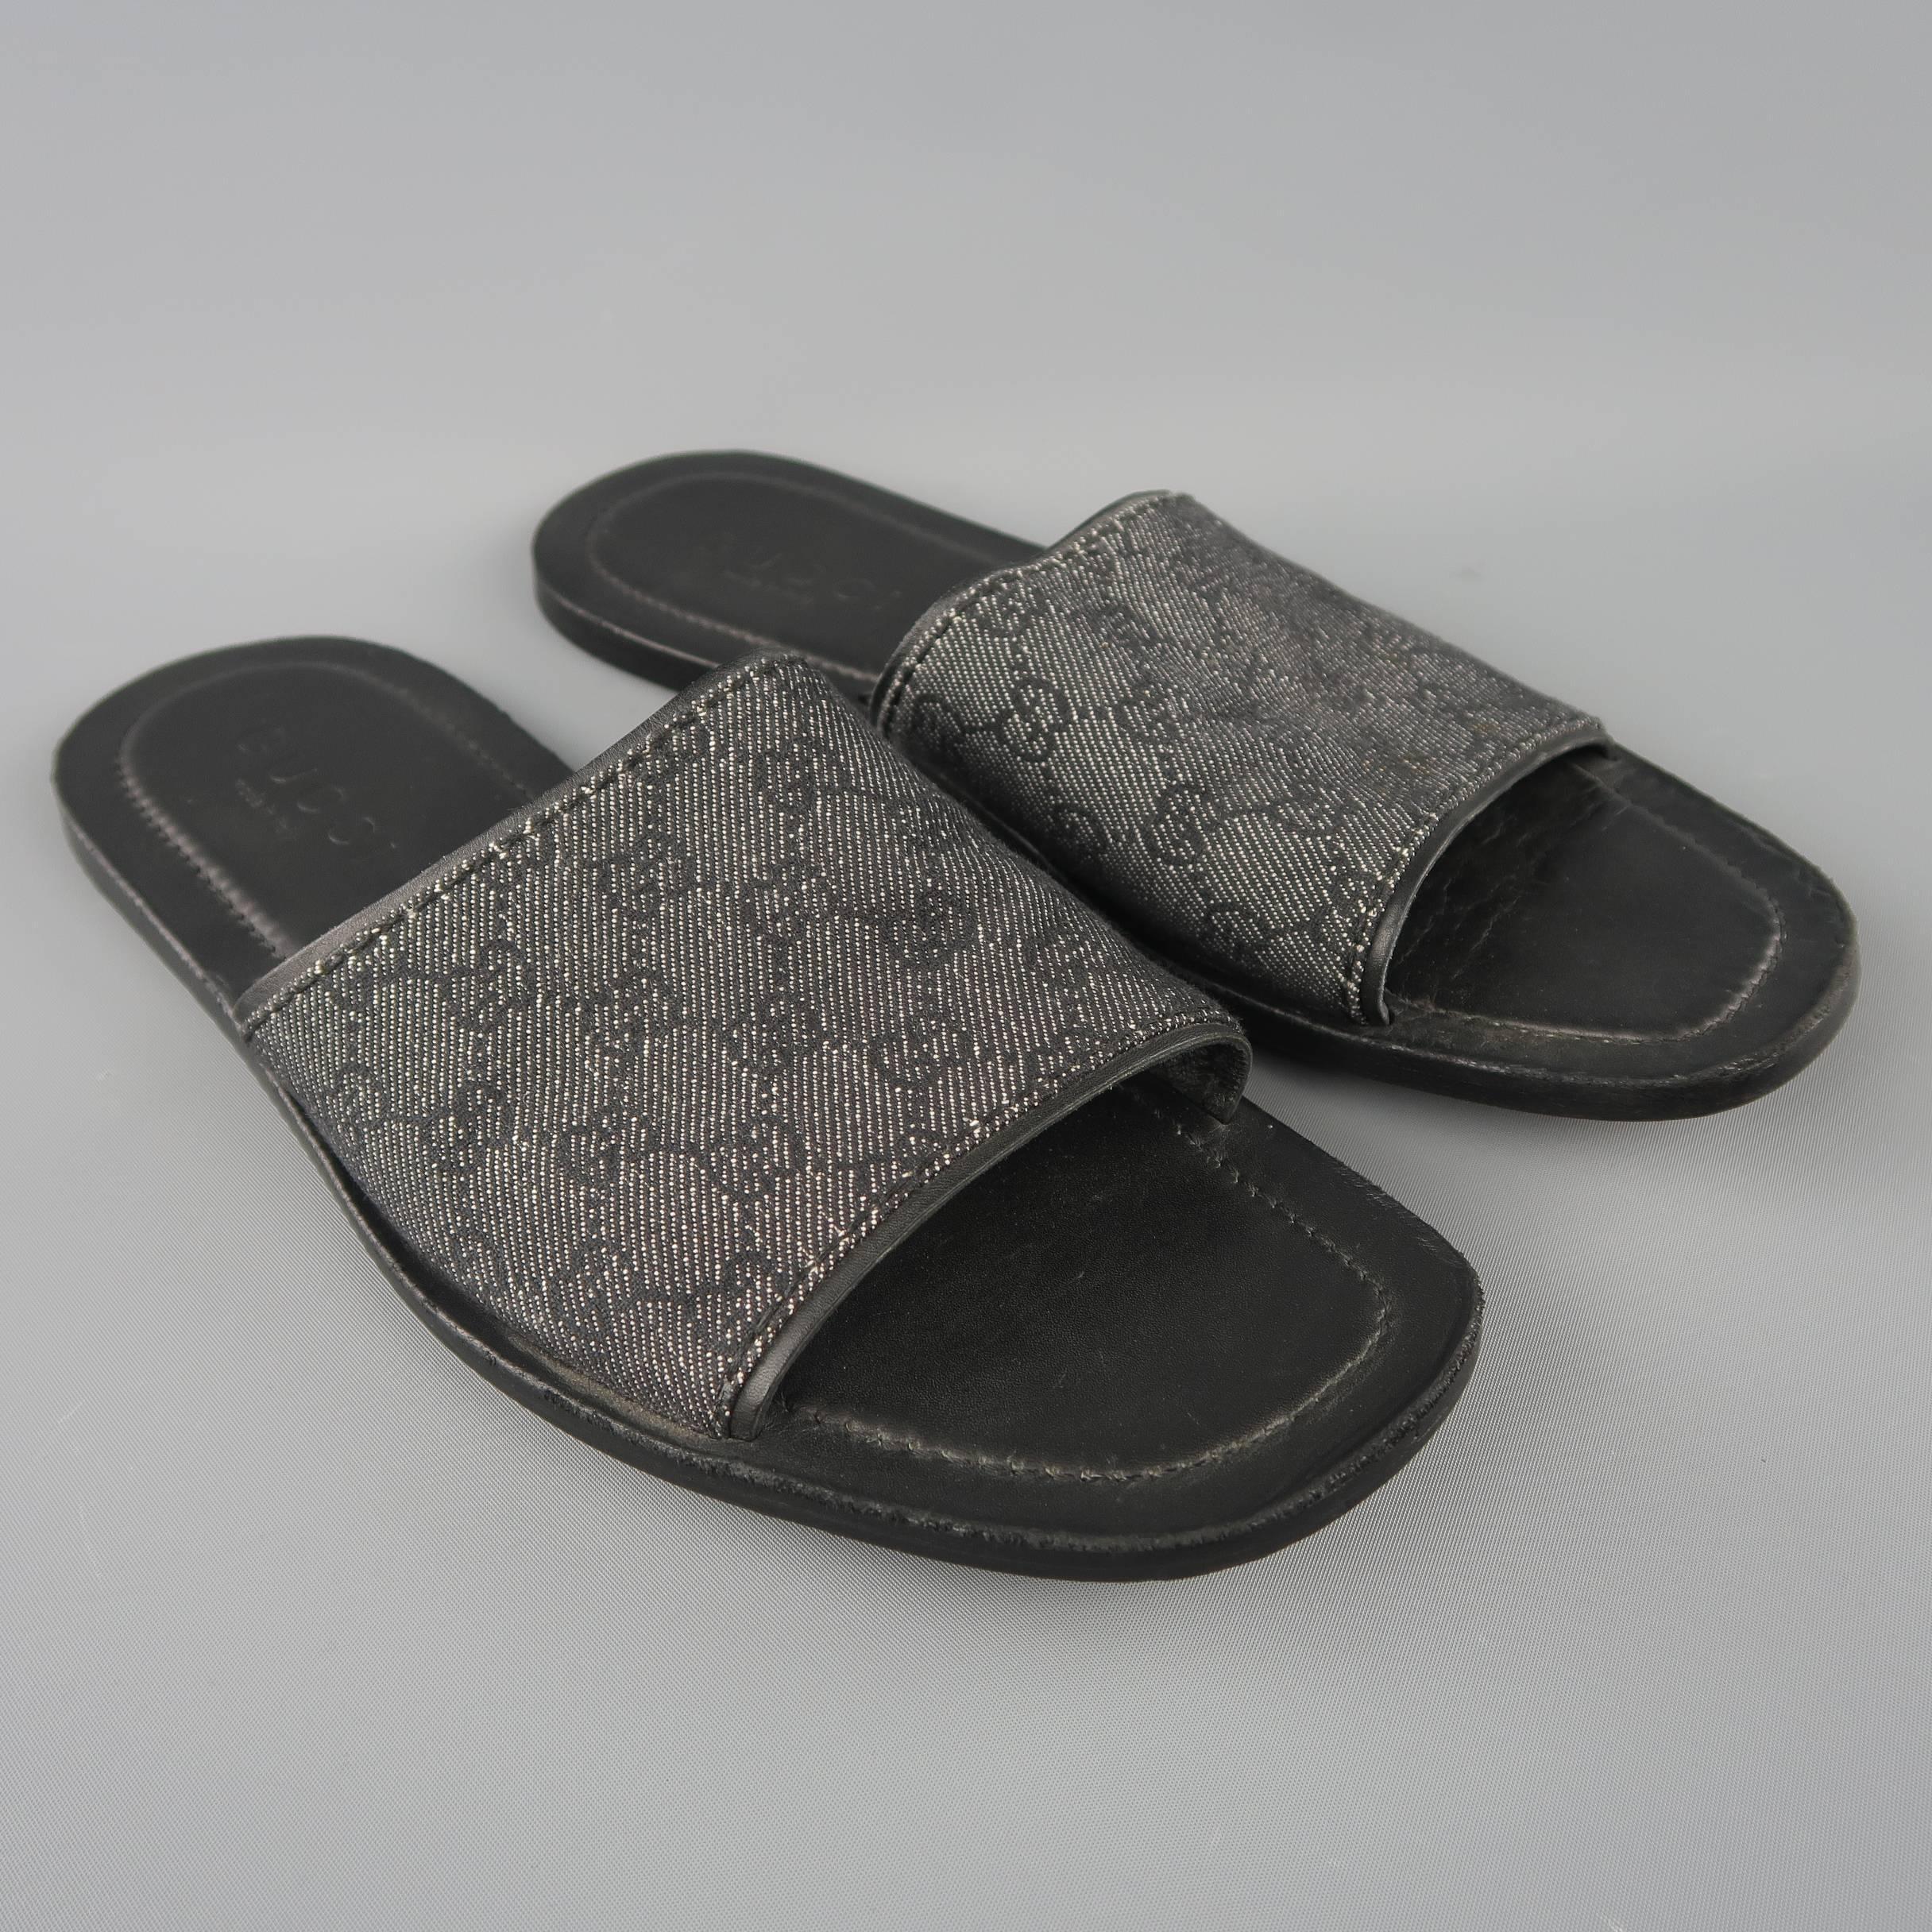 7b6cd3e35 Men s GUCCI Size 11.5 Black Guccissima Monogram Canvas Slide Sandals at  1stdibs